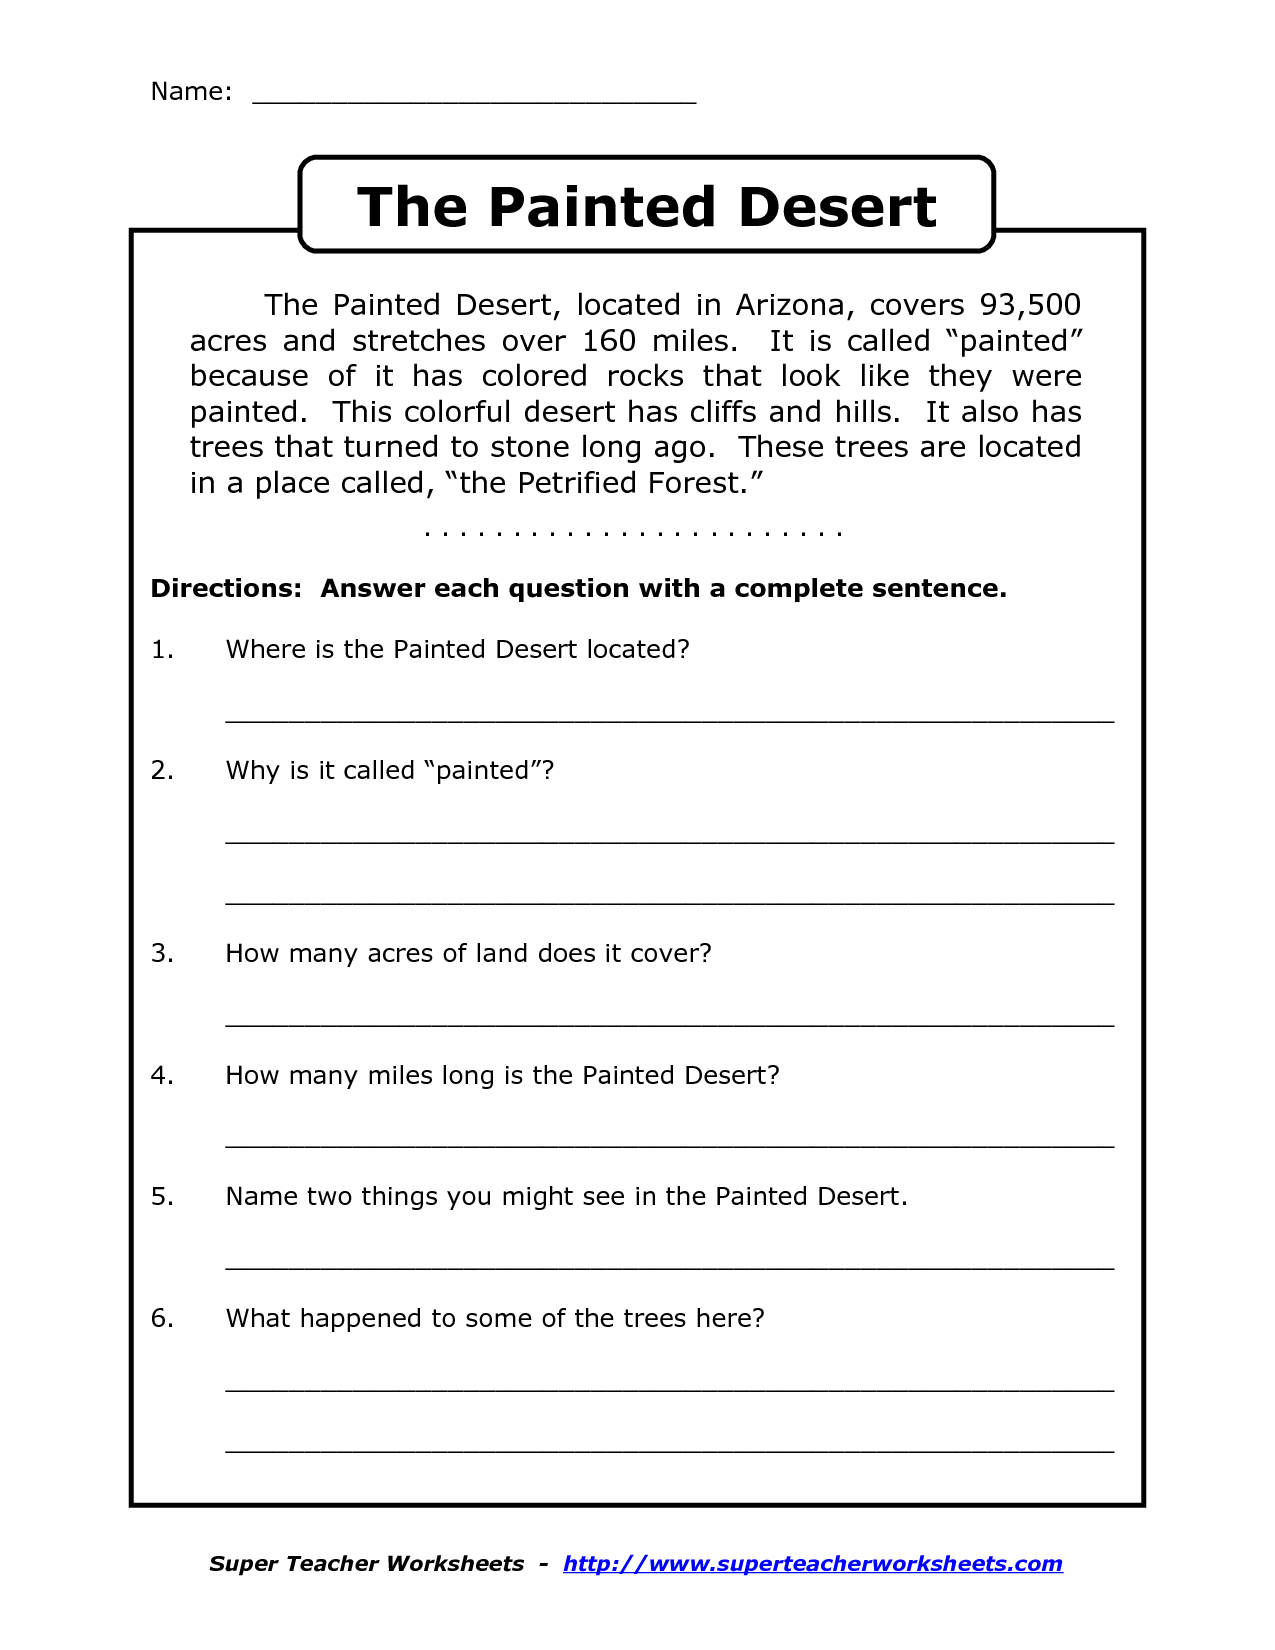 Reading Worksheets For 4Th Grade | Reading Comprehension Worksheets | Printable Reading Worksheets 4Th Grade